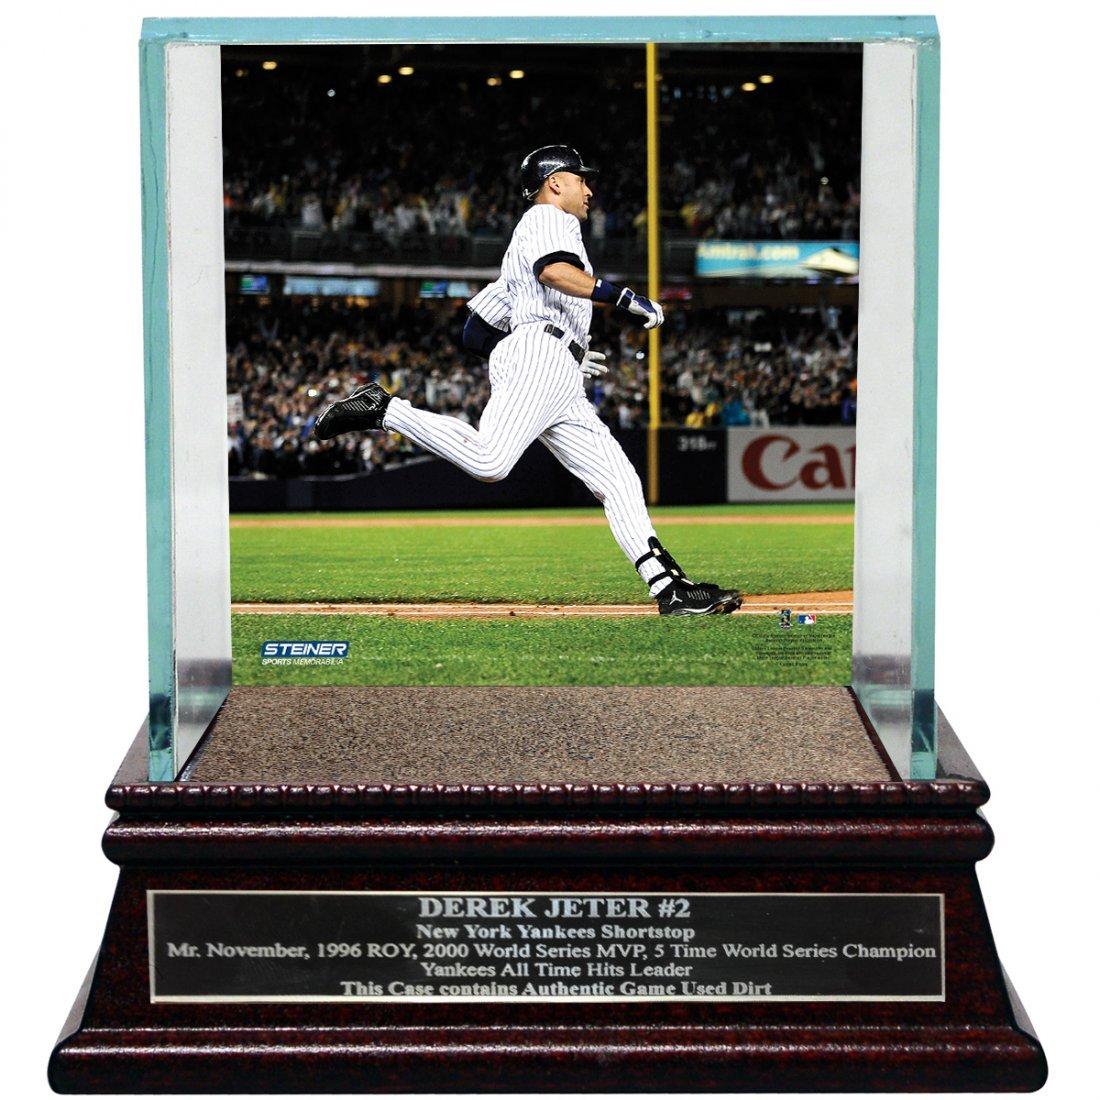 Derek Jeter Moments: Passing Gehrig Background Glass Si